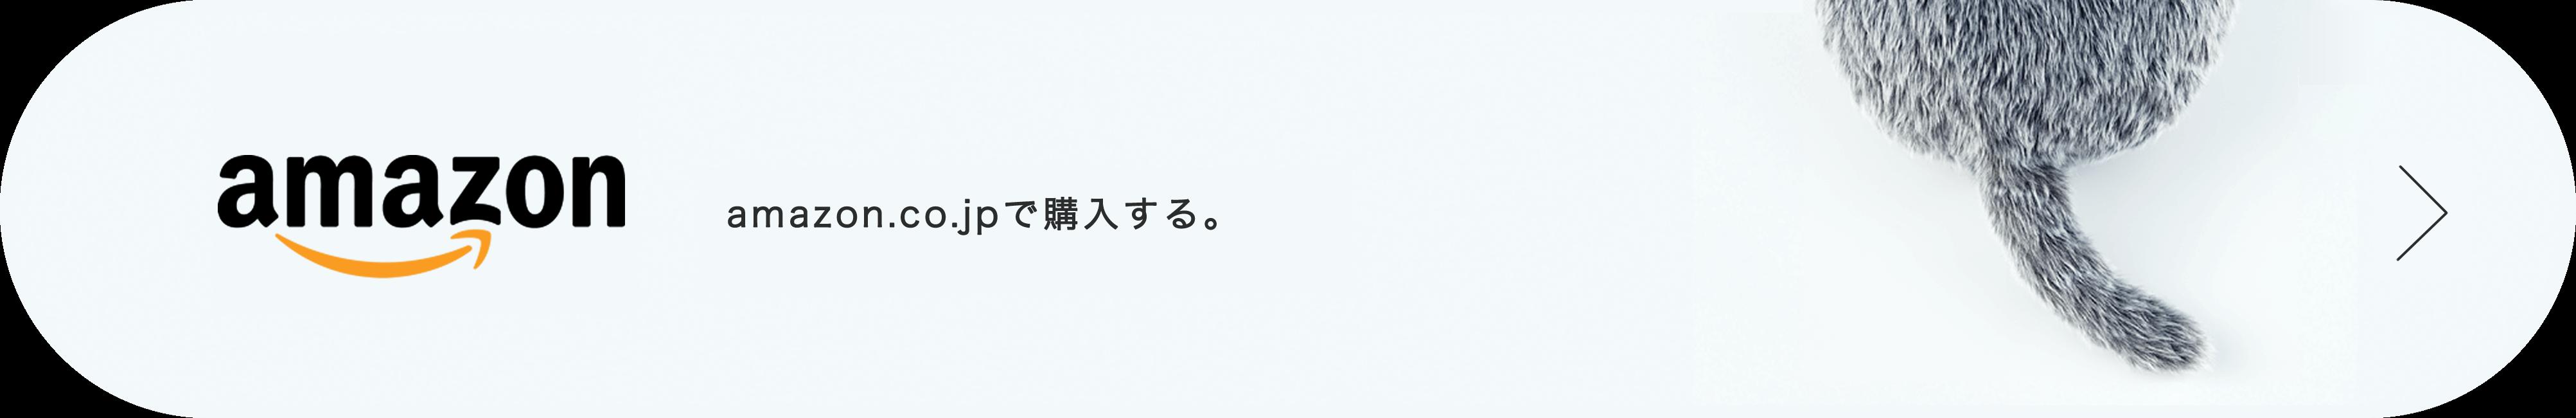 amazon.co.jpで購入できます。